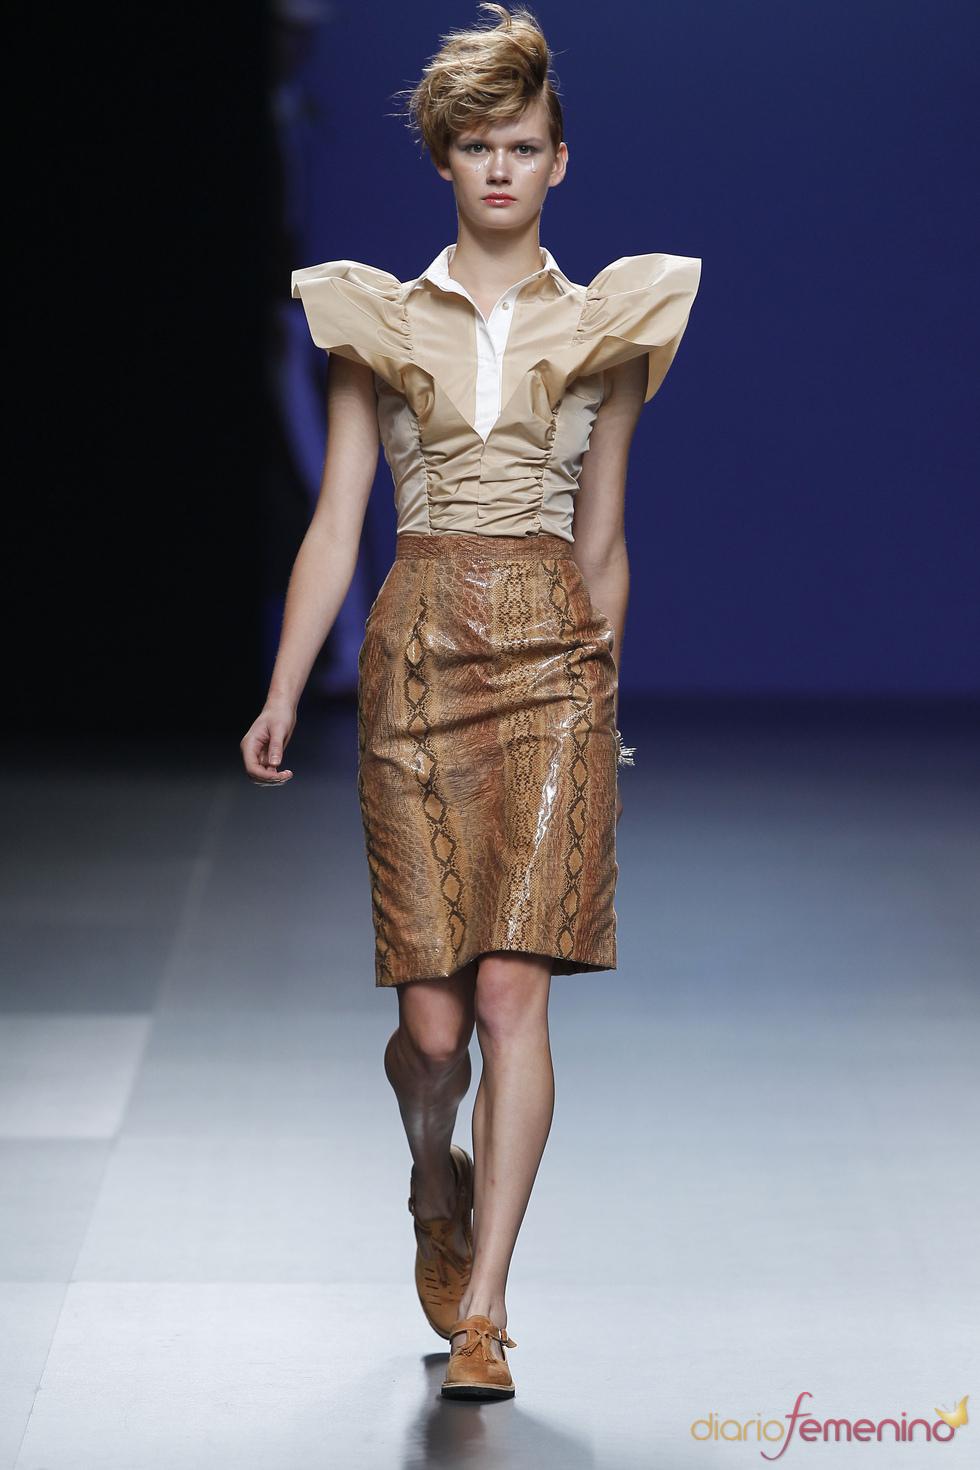 Madrid Fashion Week 2011: Antonio Alvarado